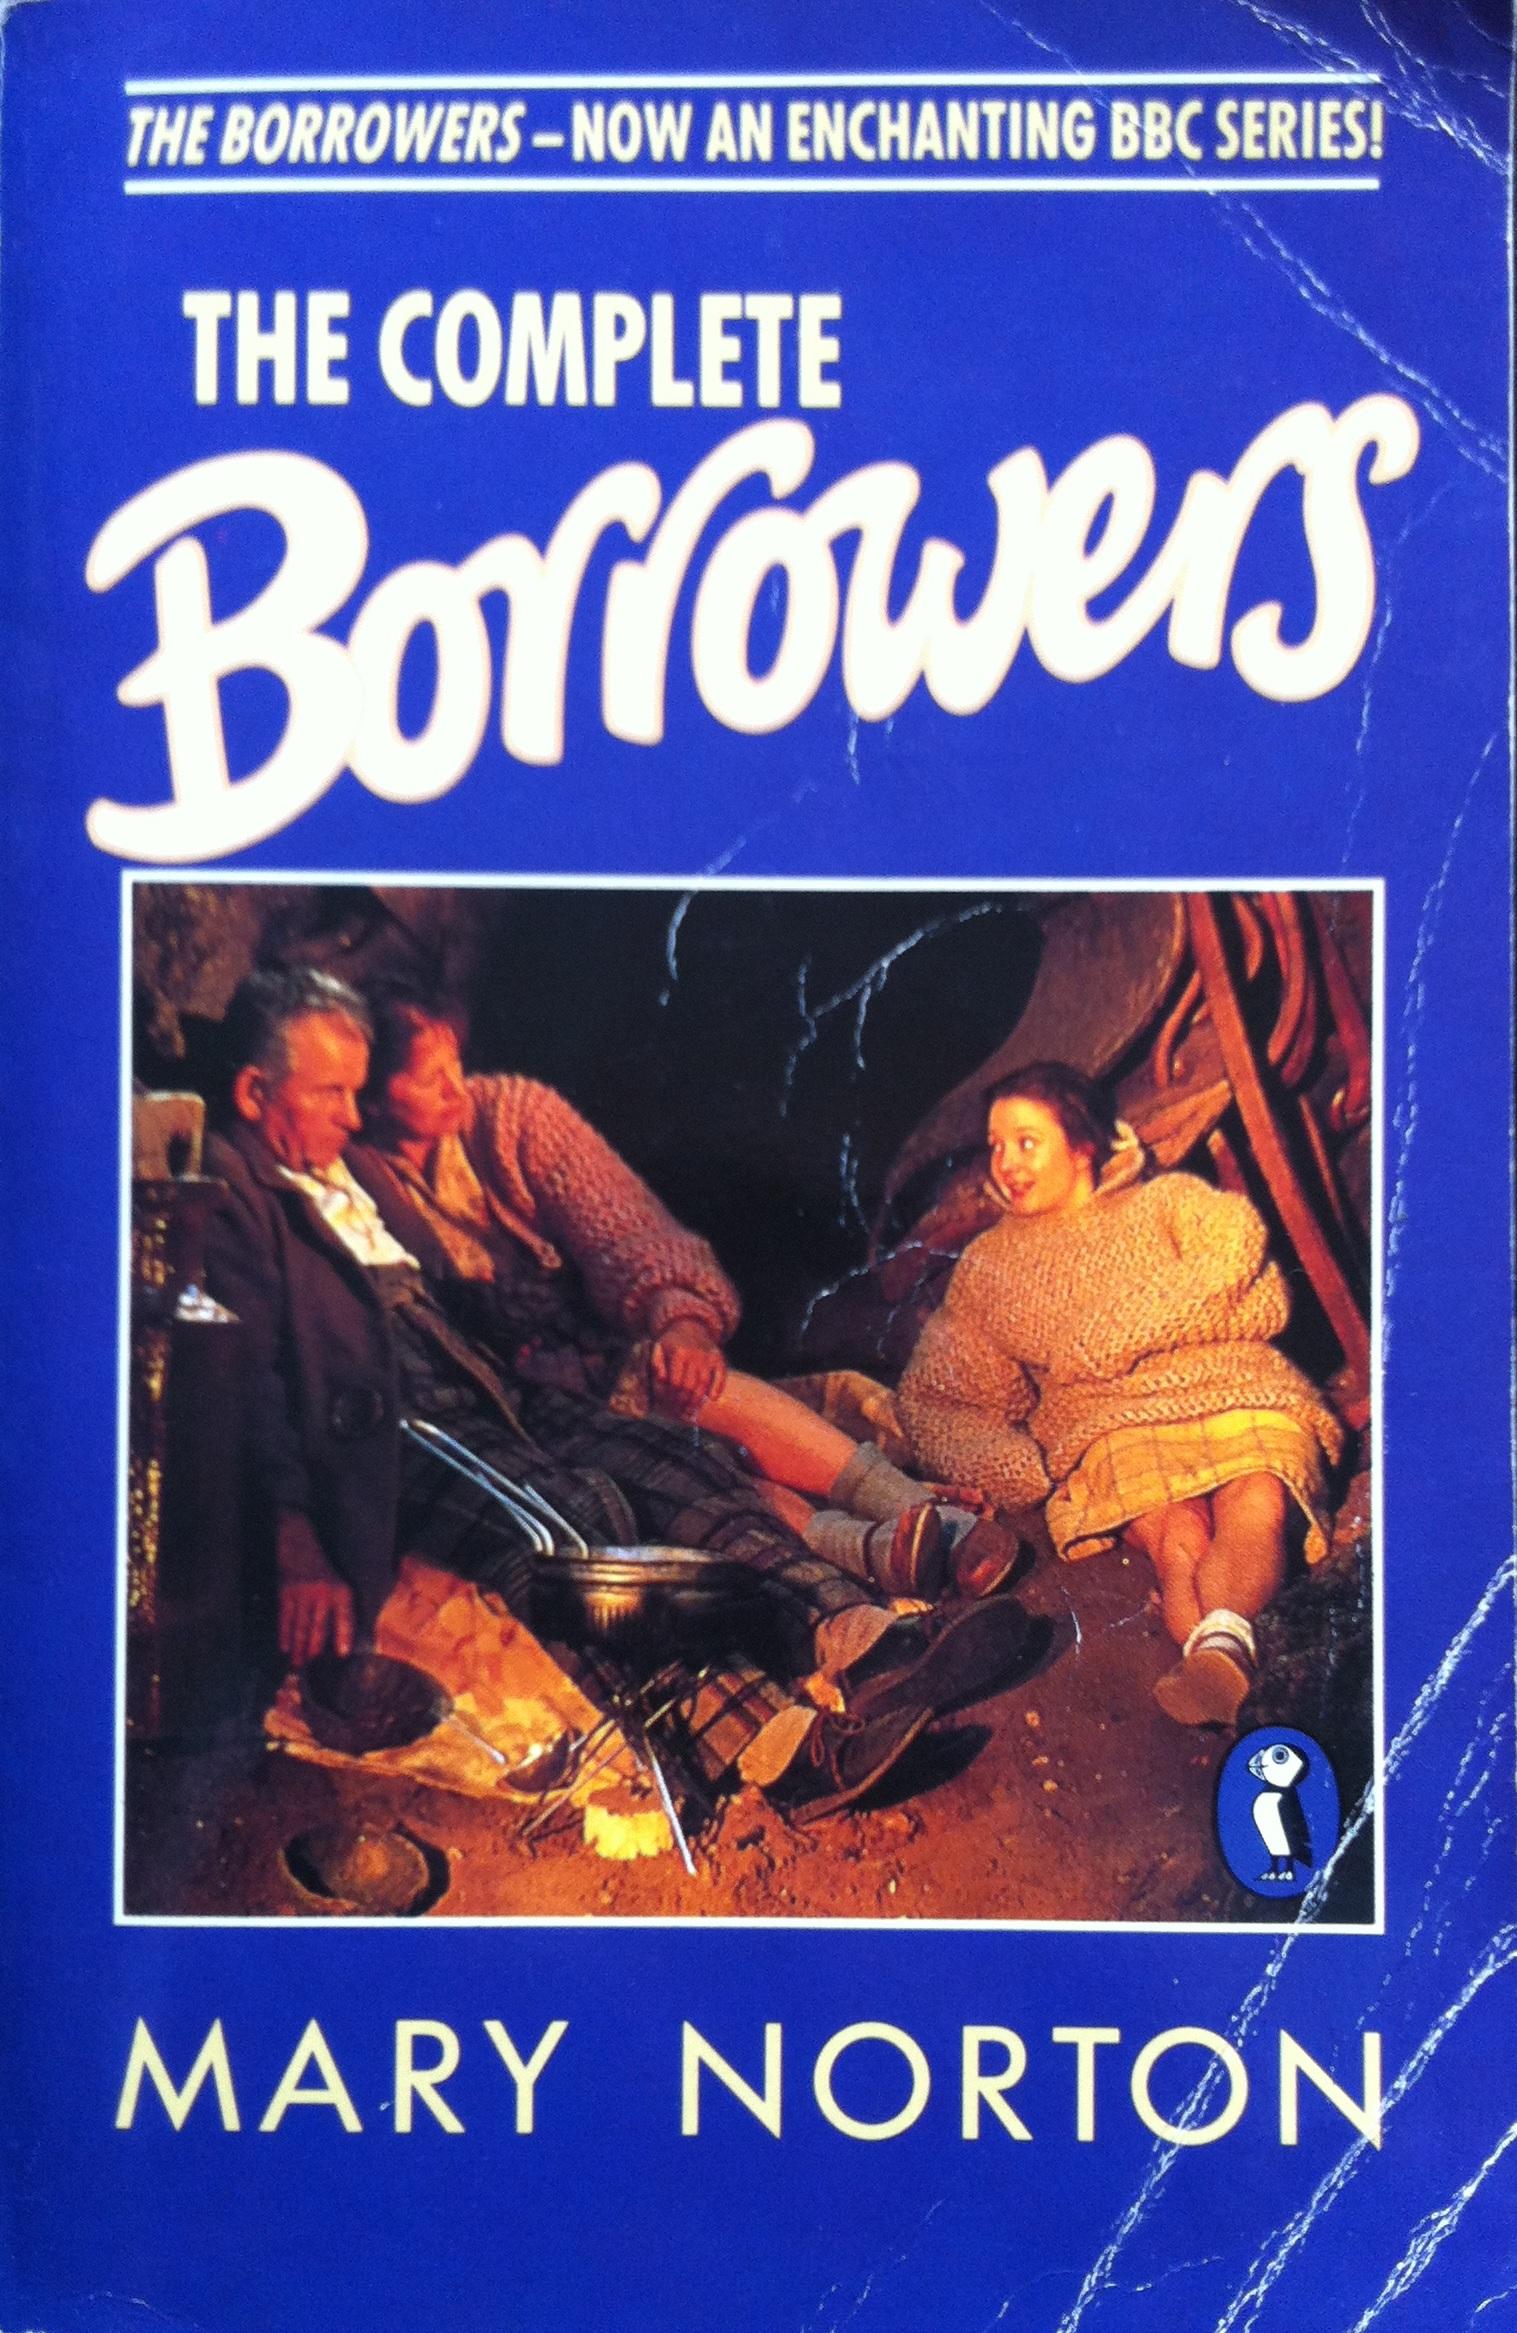 Complete Borrowers